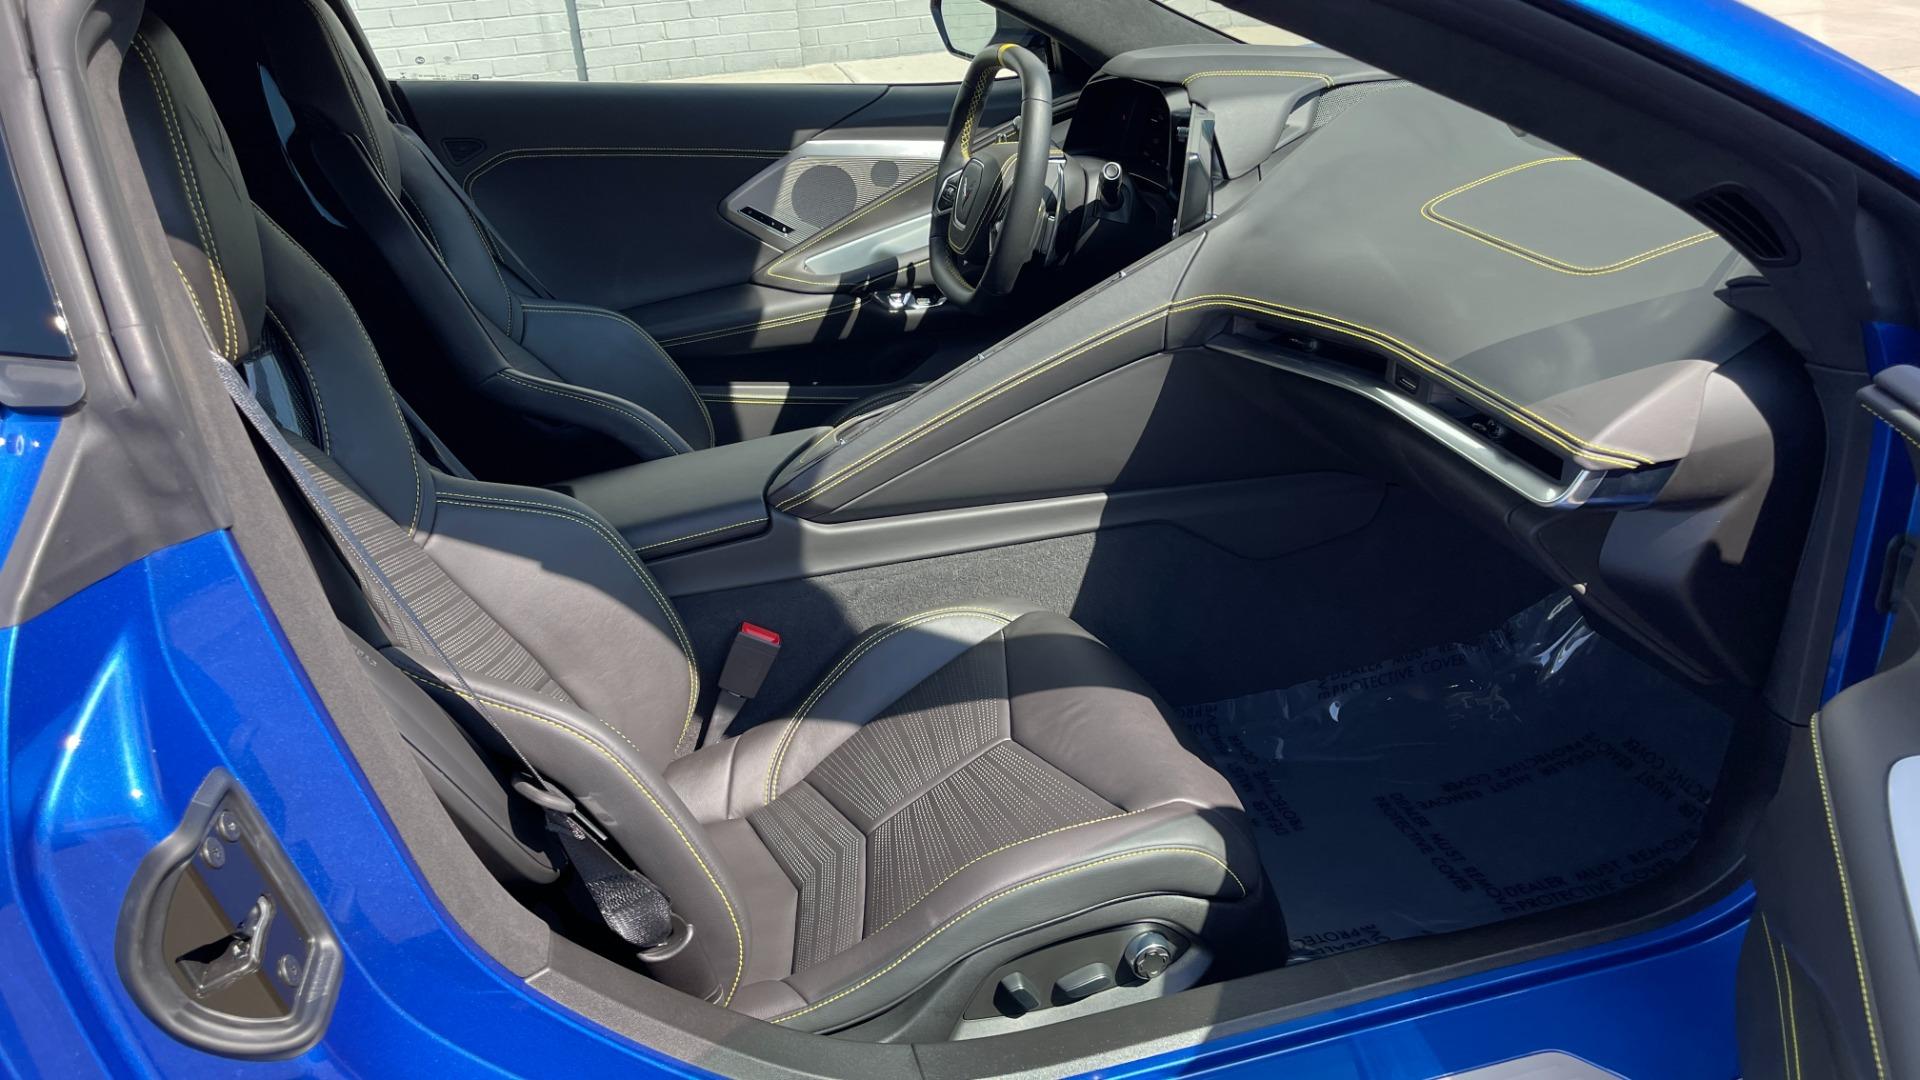 Used 2021 Chevrolet CORVETTE STINGRAY 3LT COUPE / 8-SPD / PERF PKG / NAV / BOSE / REARVIEW for sale $110,995 at Formula Imports in Charlotte NC 28227 43